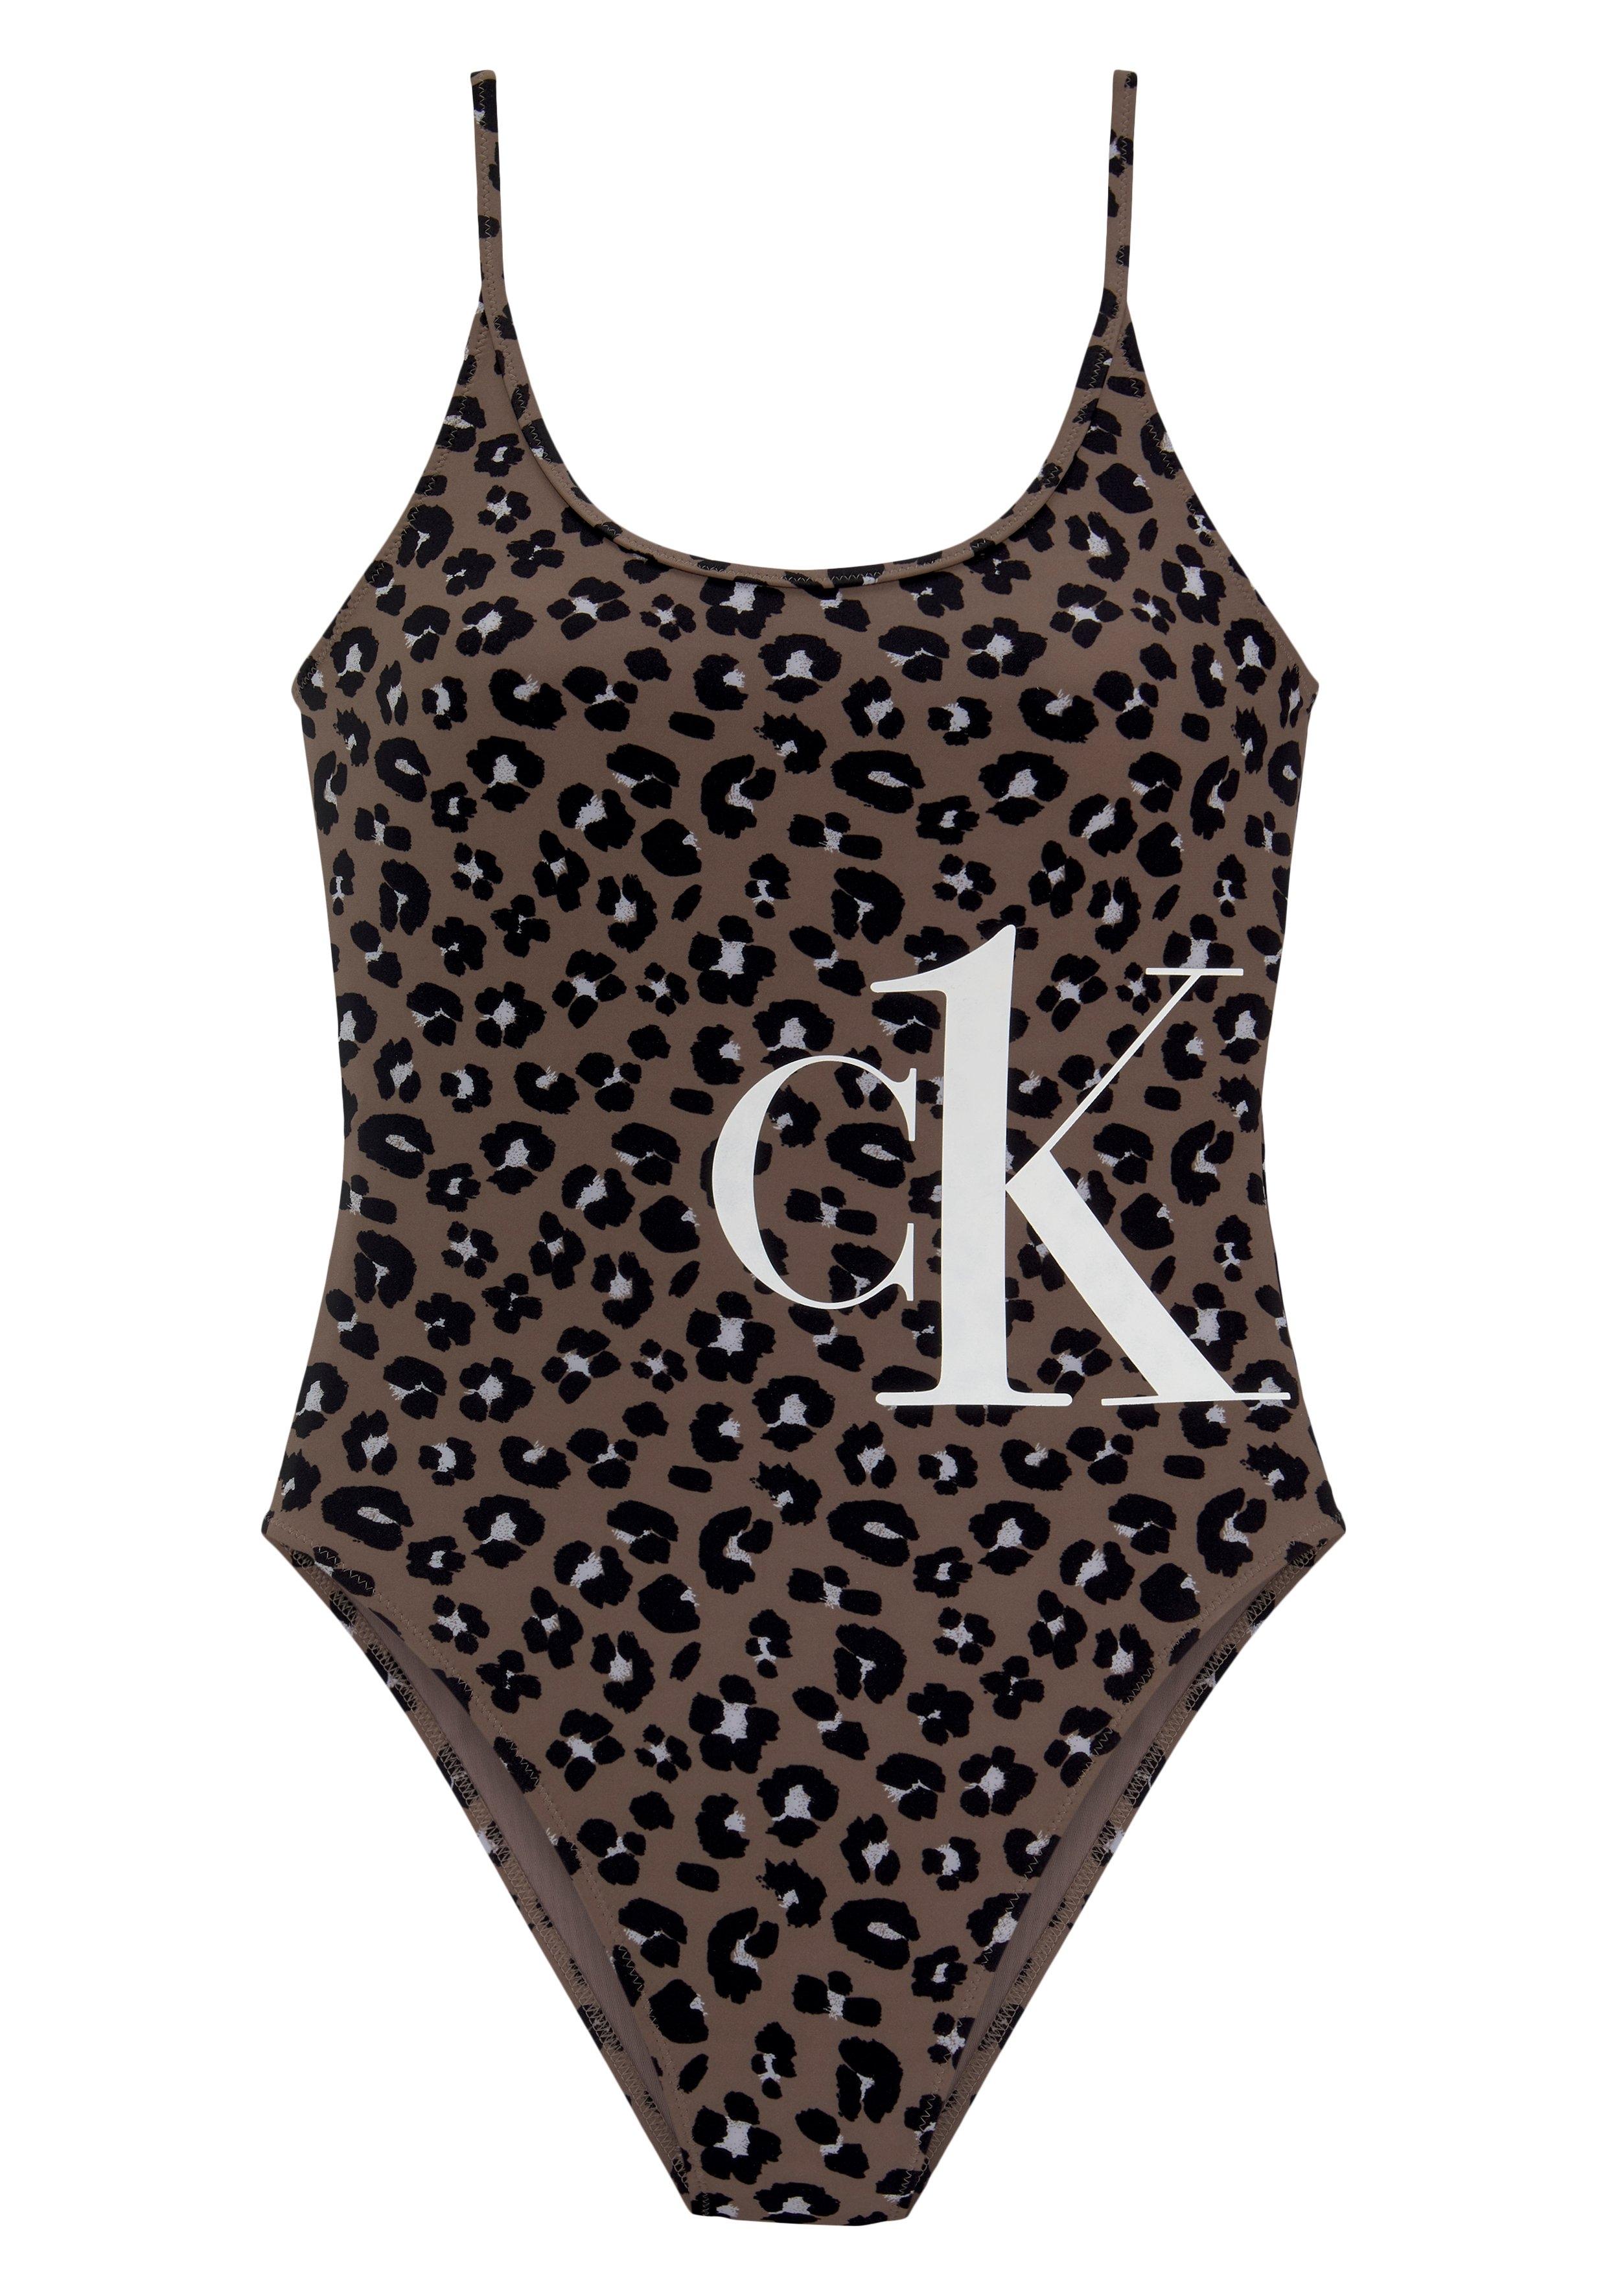 Calvin Klein badpak »Leo« goedkoop op lascana.nl kopen